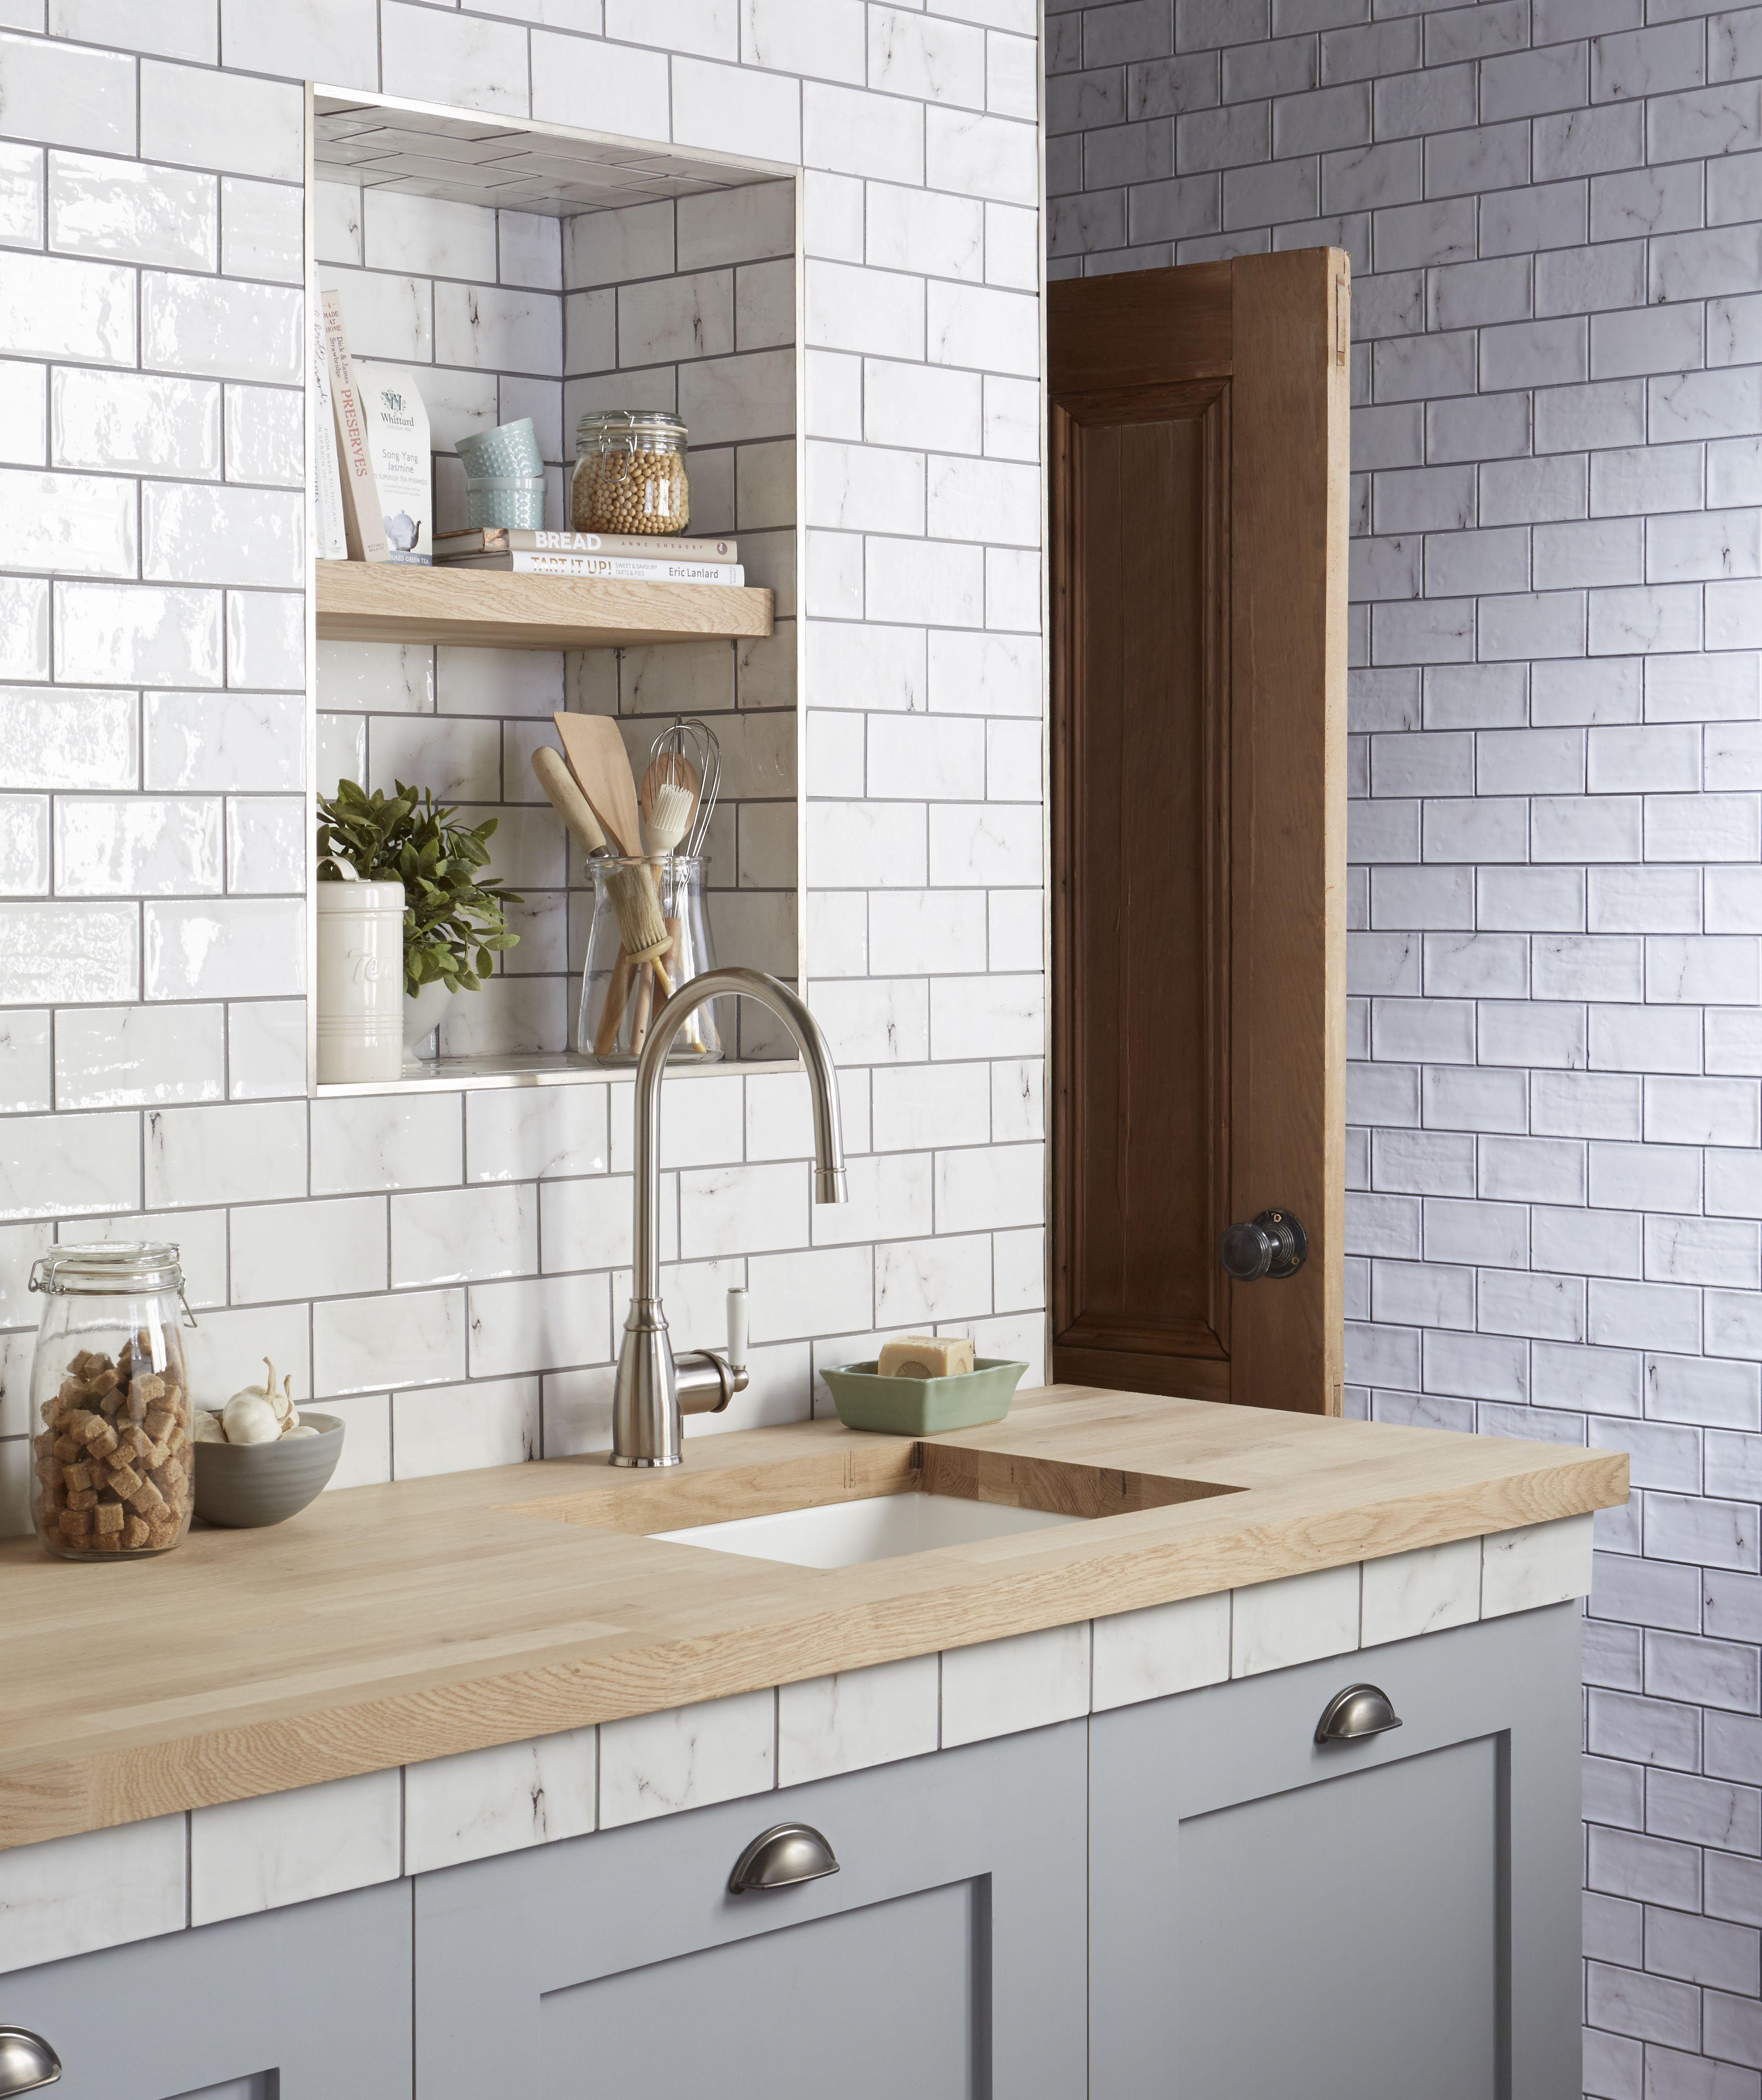 Vyne White Gloss Wall Tiles Kitchen tiles, Kitchen wall